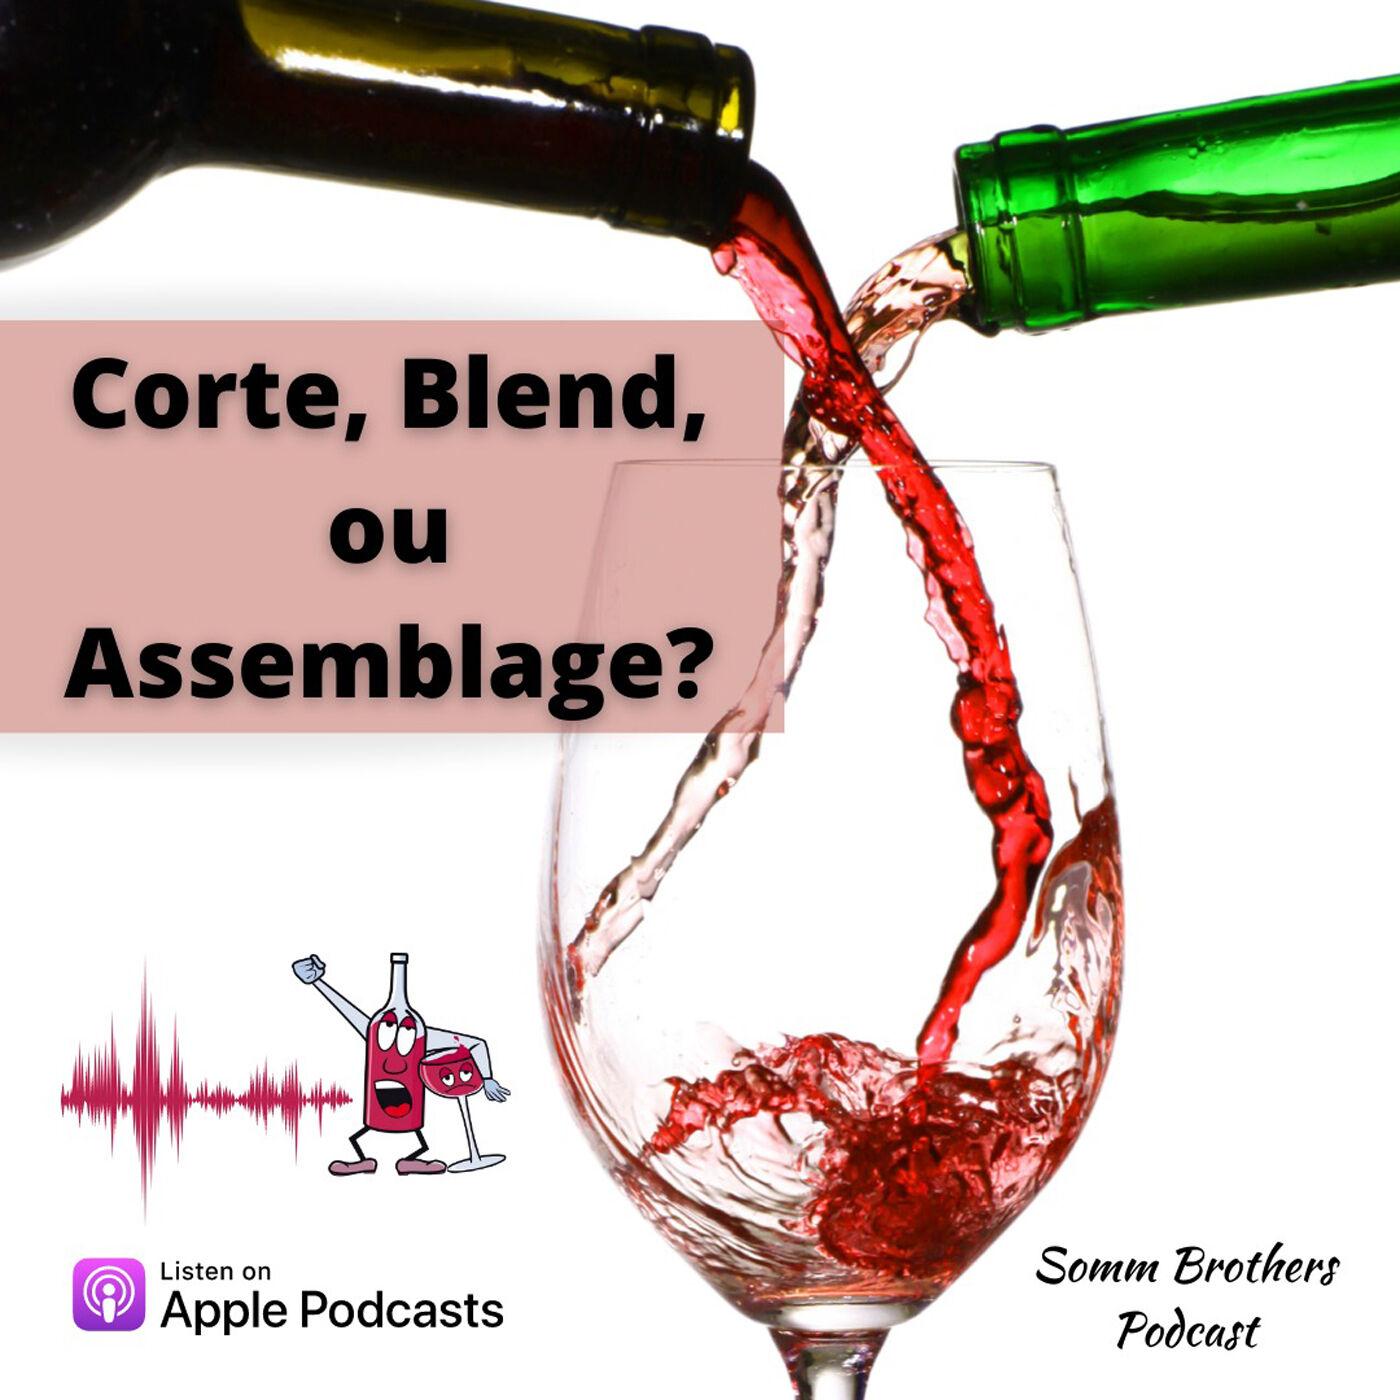 EP #041 - Corte, Blend ou Assemblage?